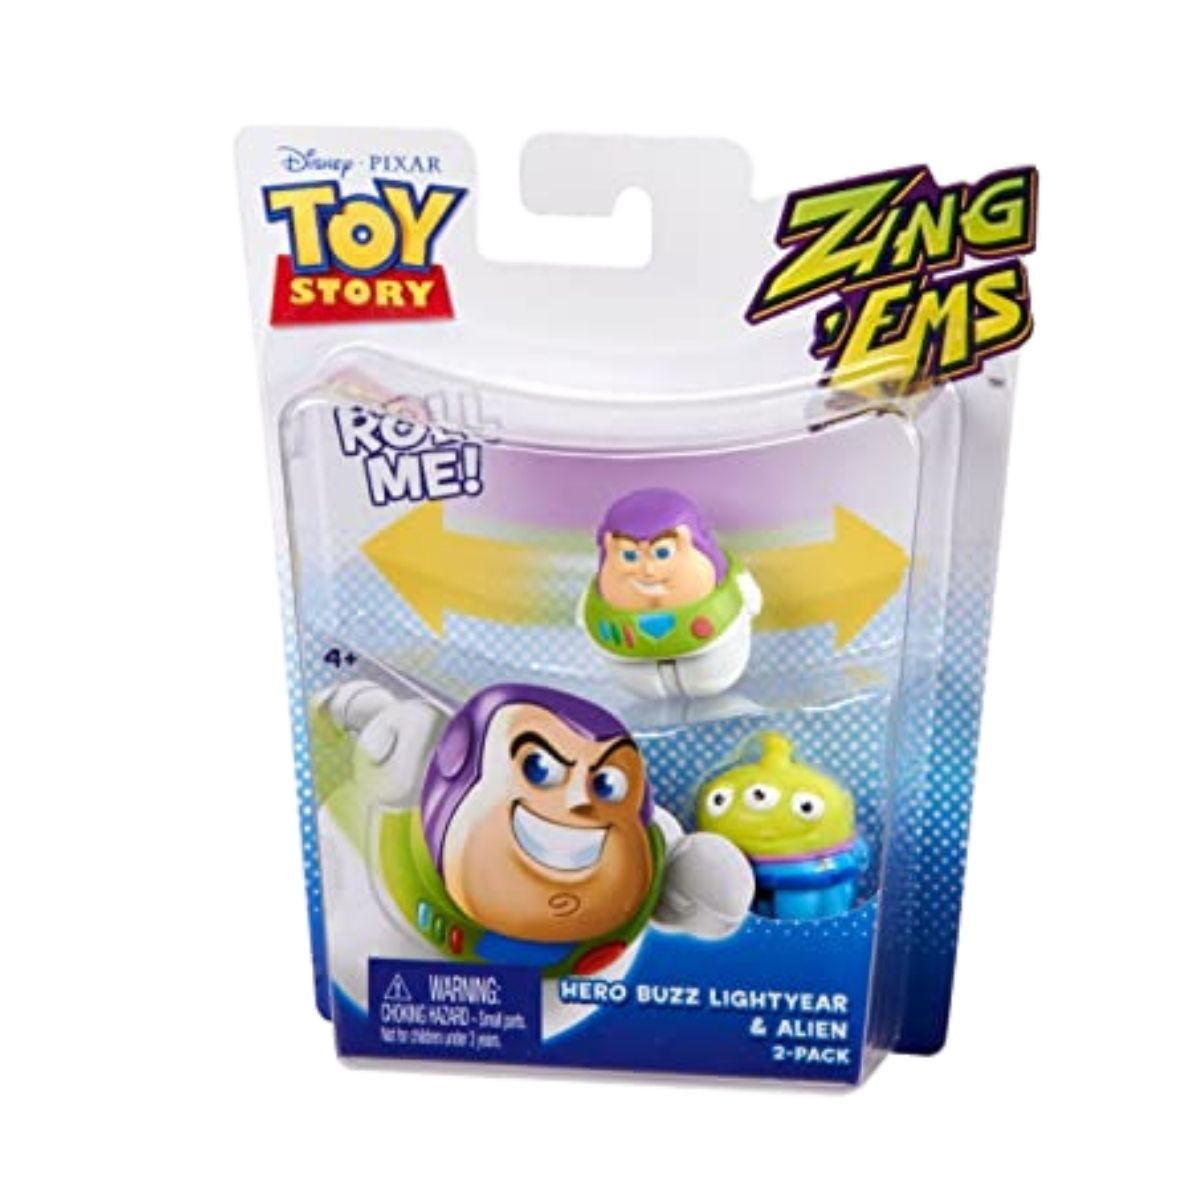 Boneco Toy Story com 2 unidades brinquedo Buzz & Alien  - Game Land Brinquedos